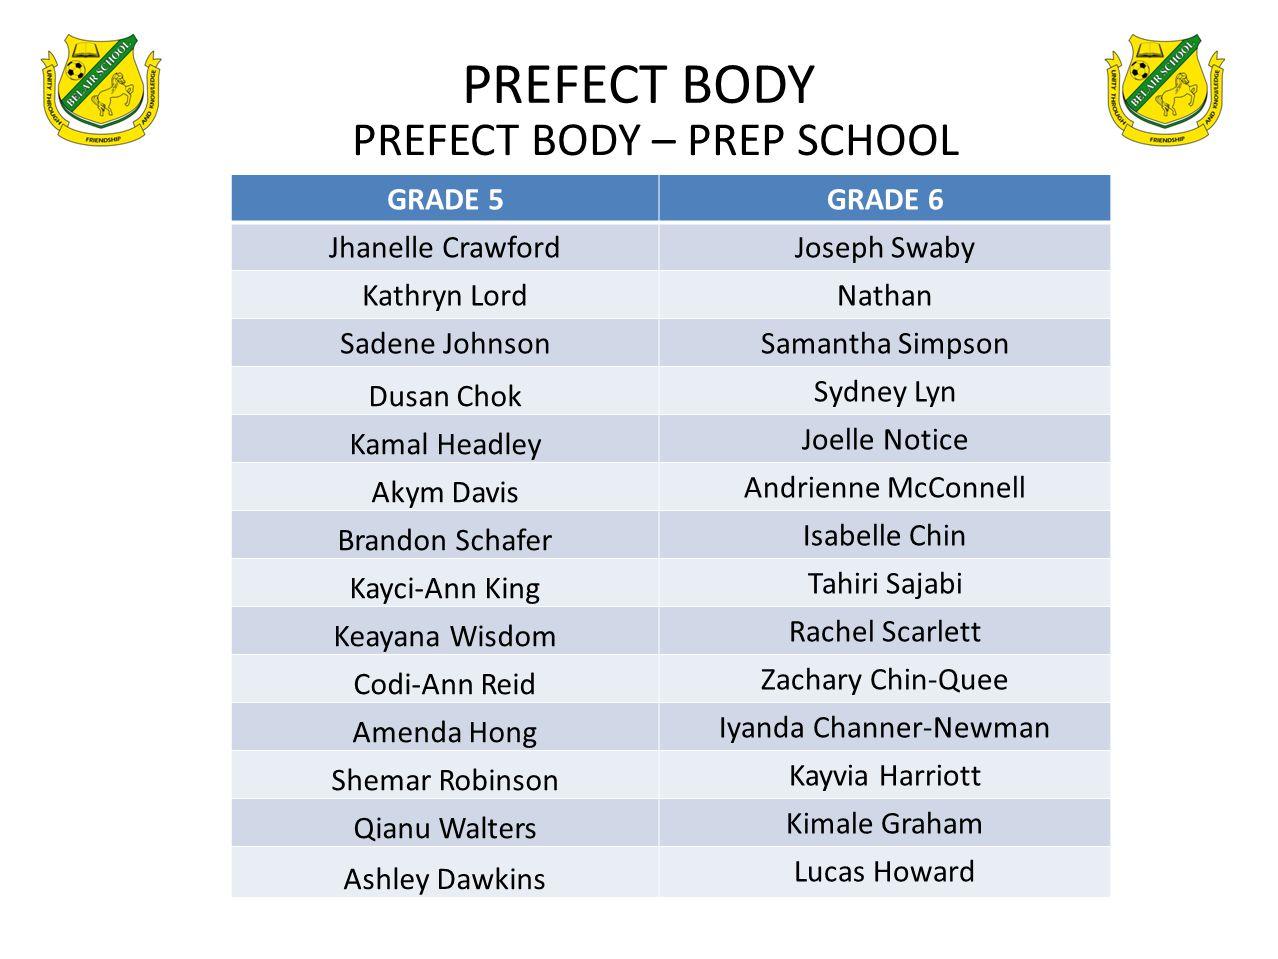 PREFECT BODY PREFECT BODY – PREP SCHOOL GRADE 5 GRADE 6